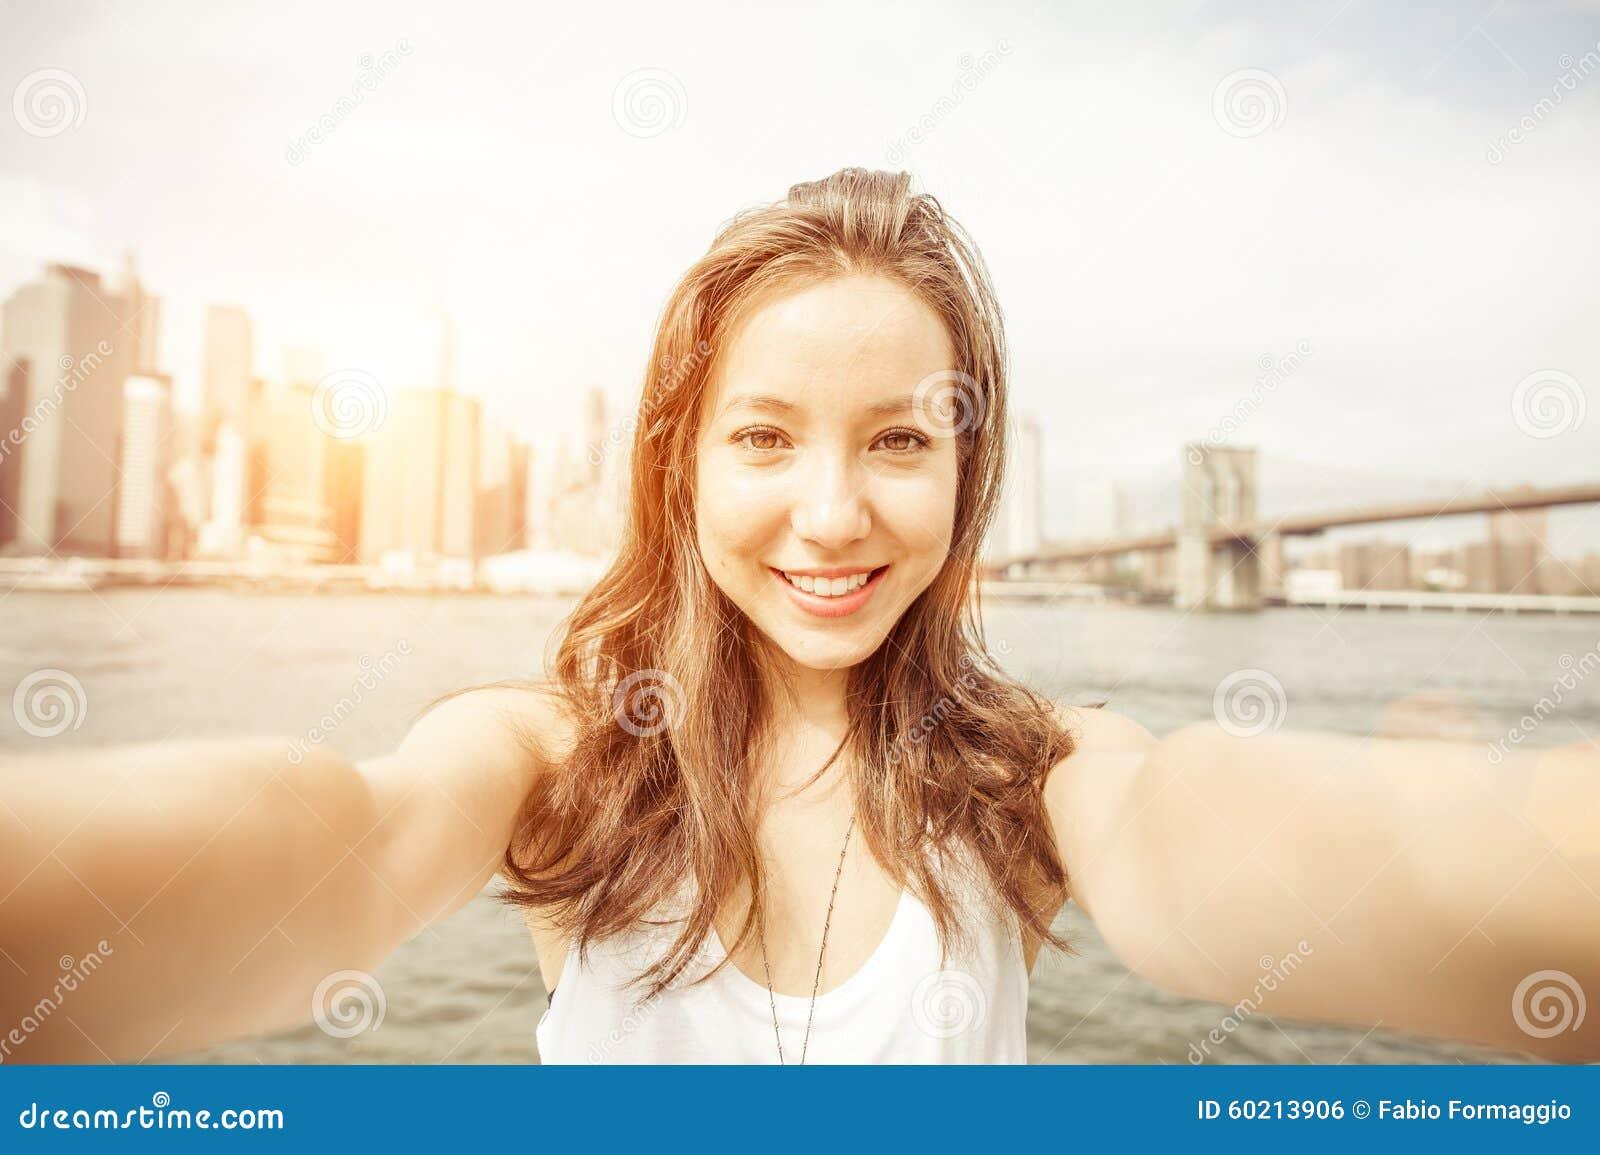 heißes Mädchen Modellbild